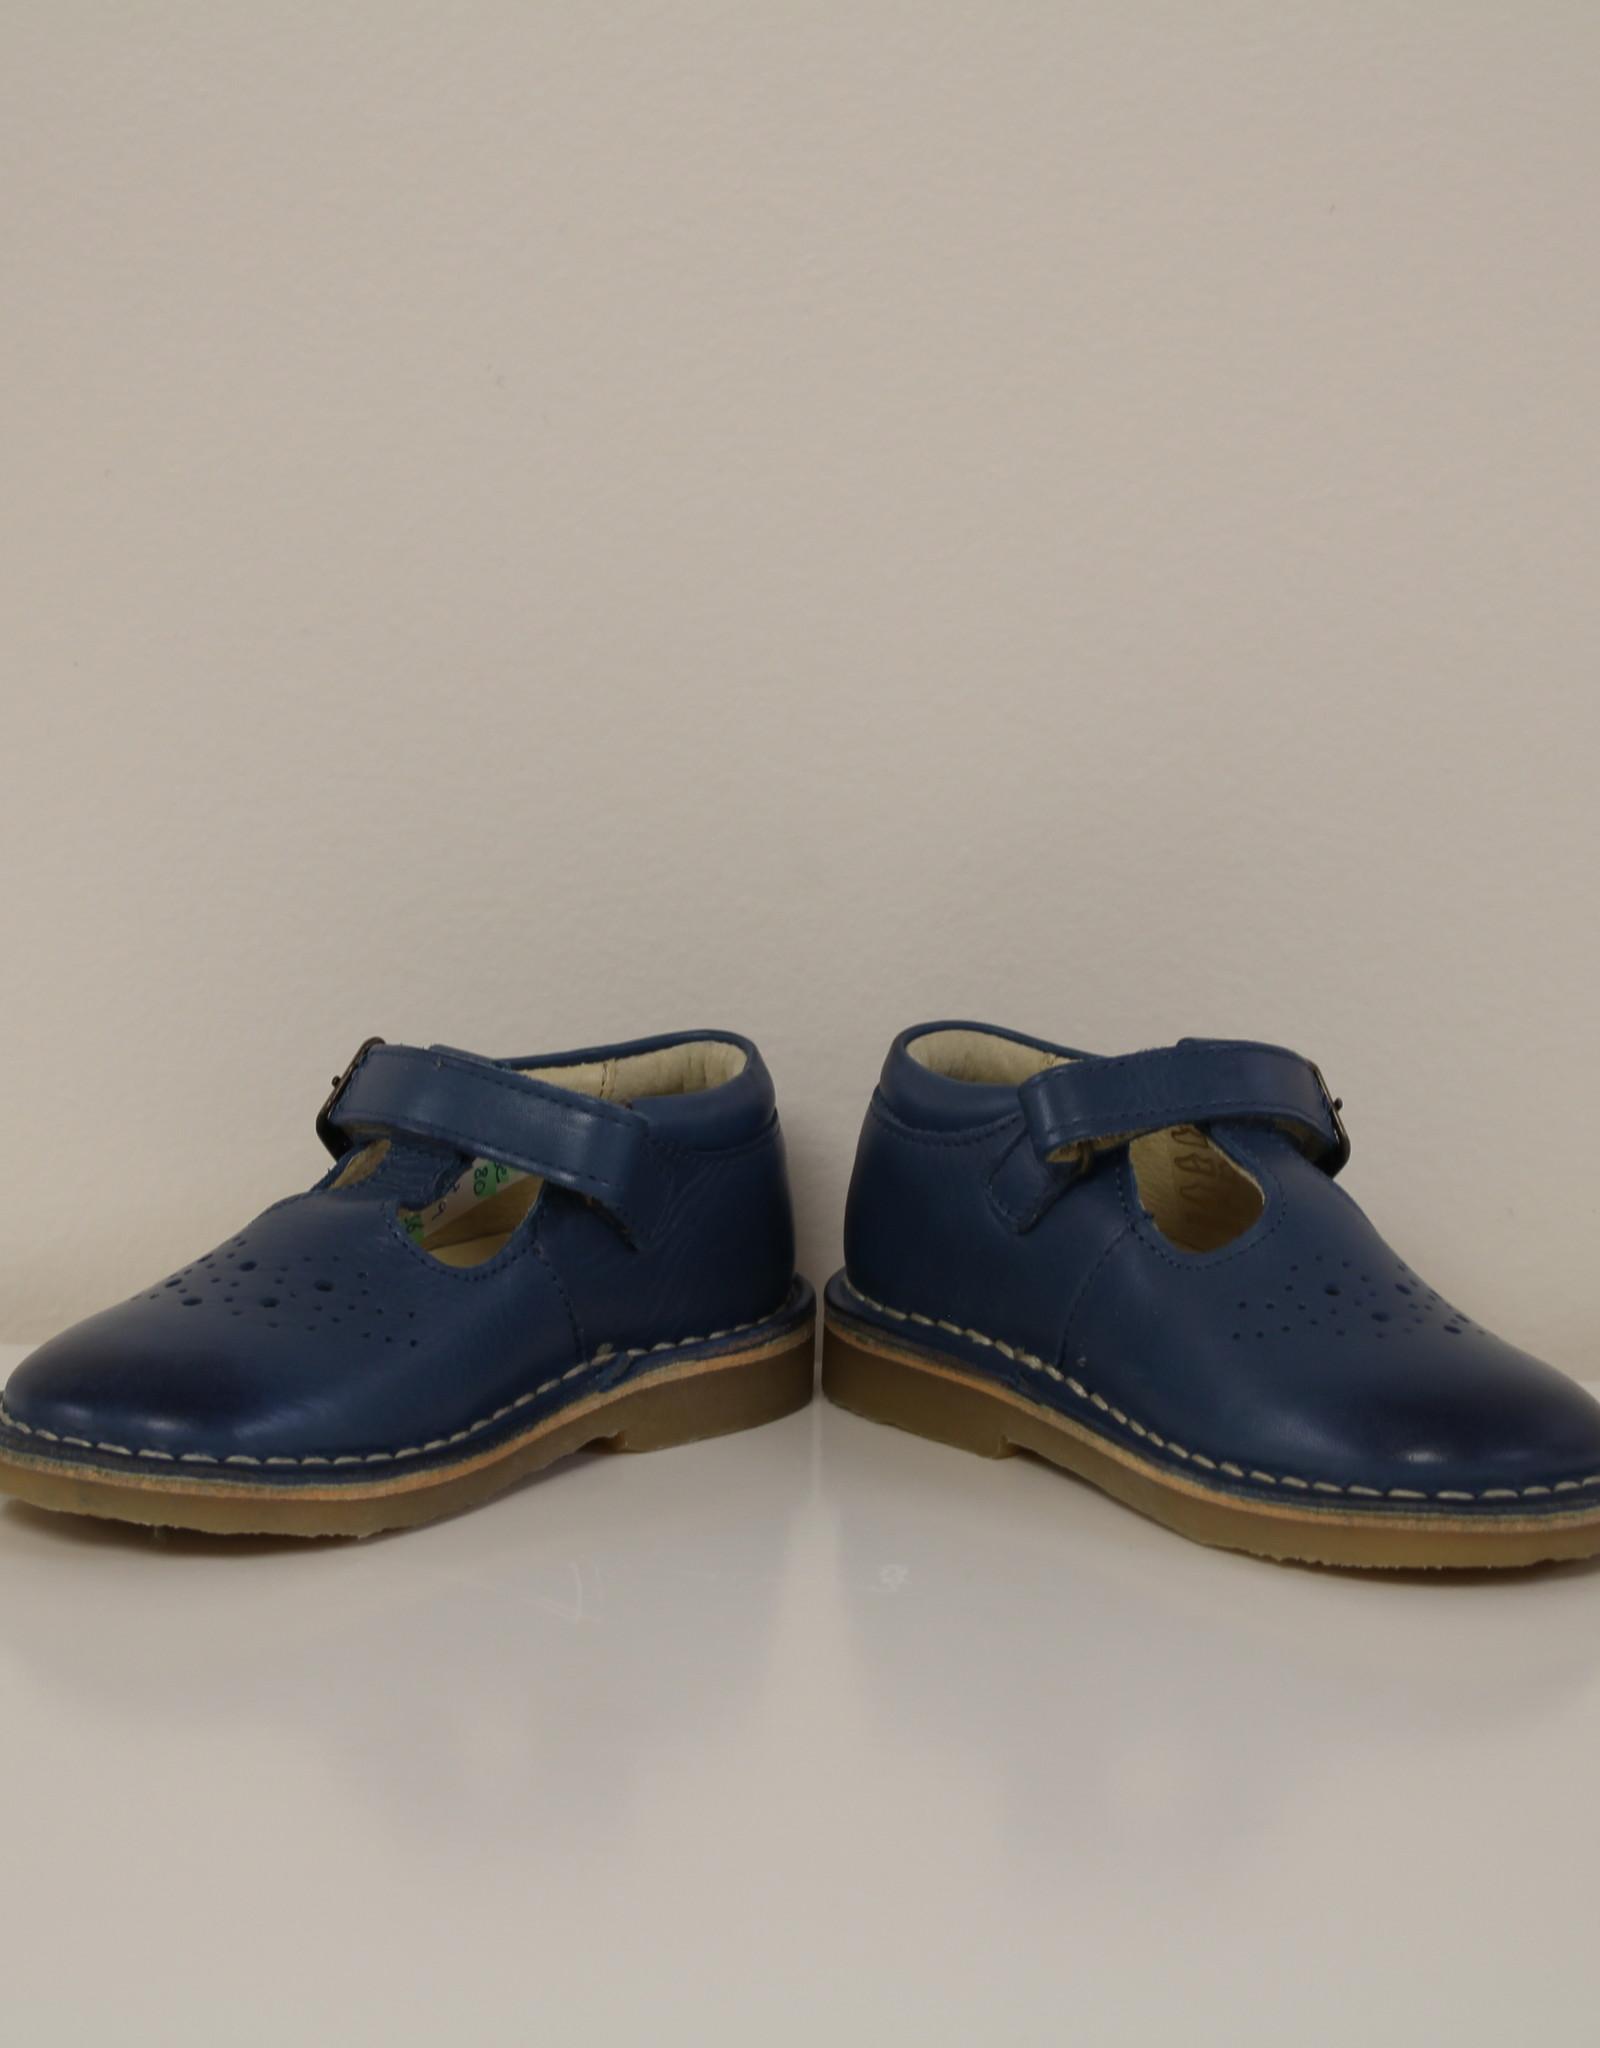 t-bar shoe rubber sole ocean blue